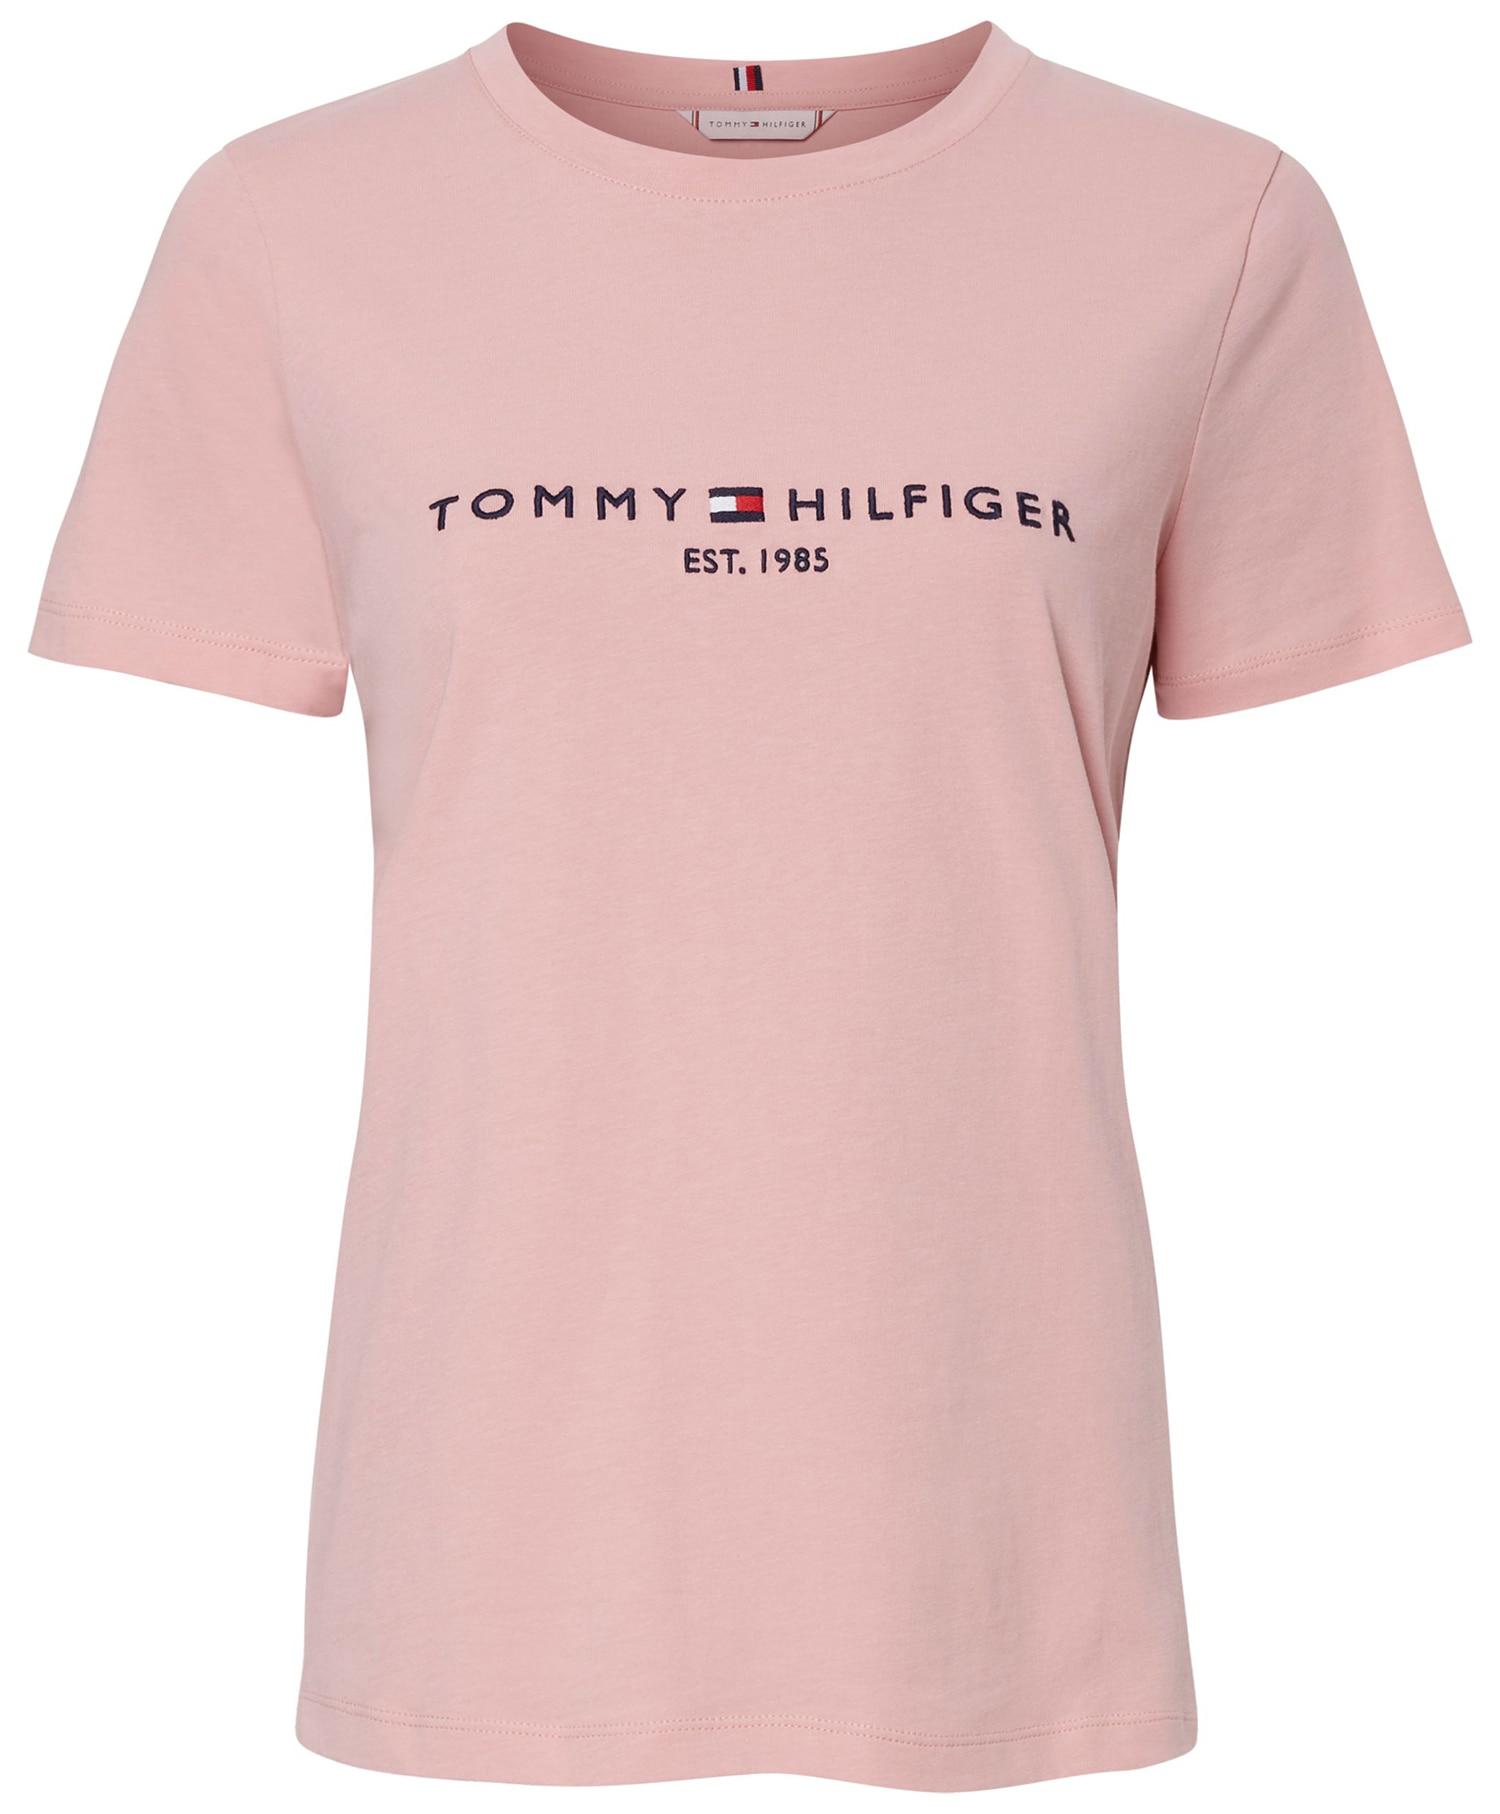 Tommy Hilfiger C-neck Tee